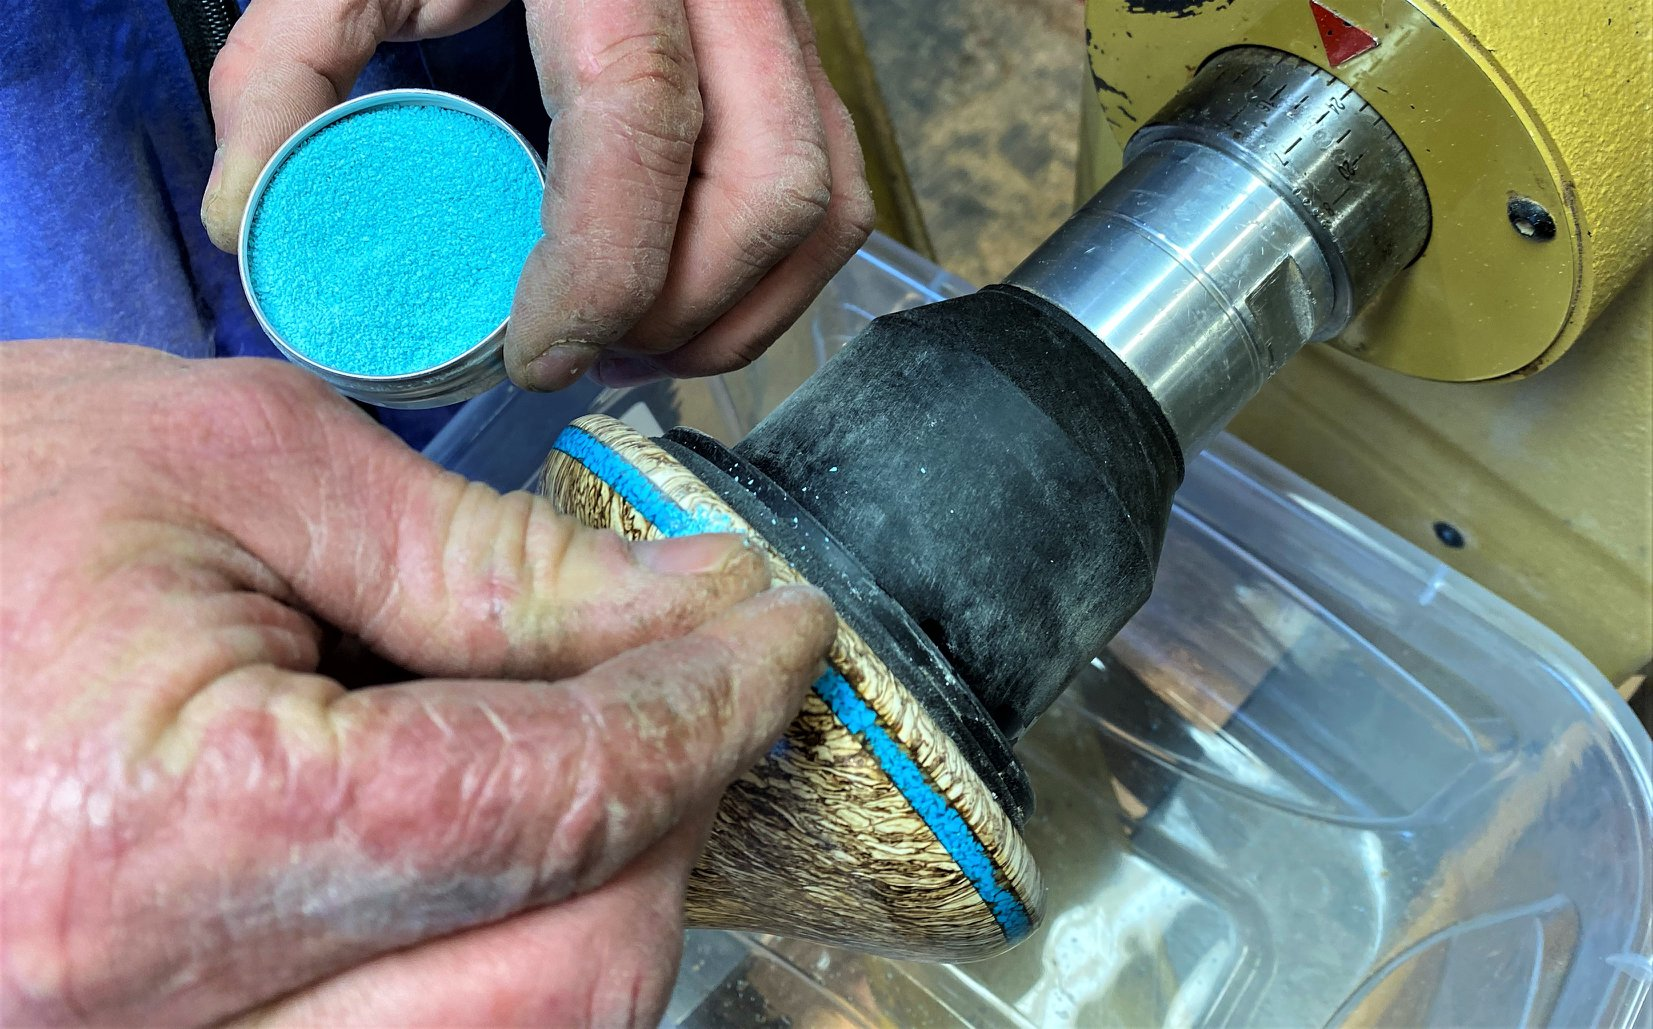 detailing hemp wood